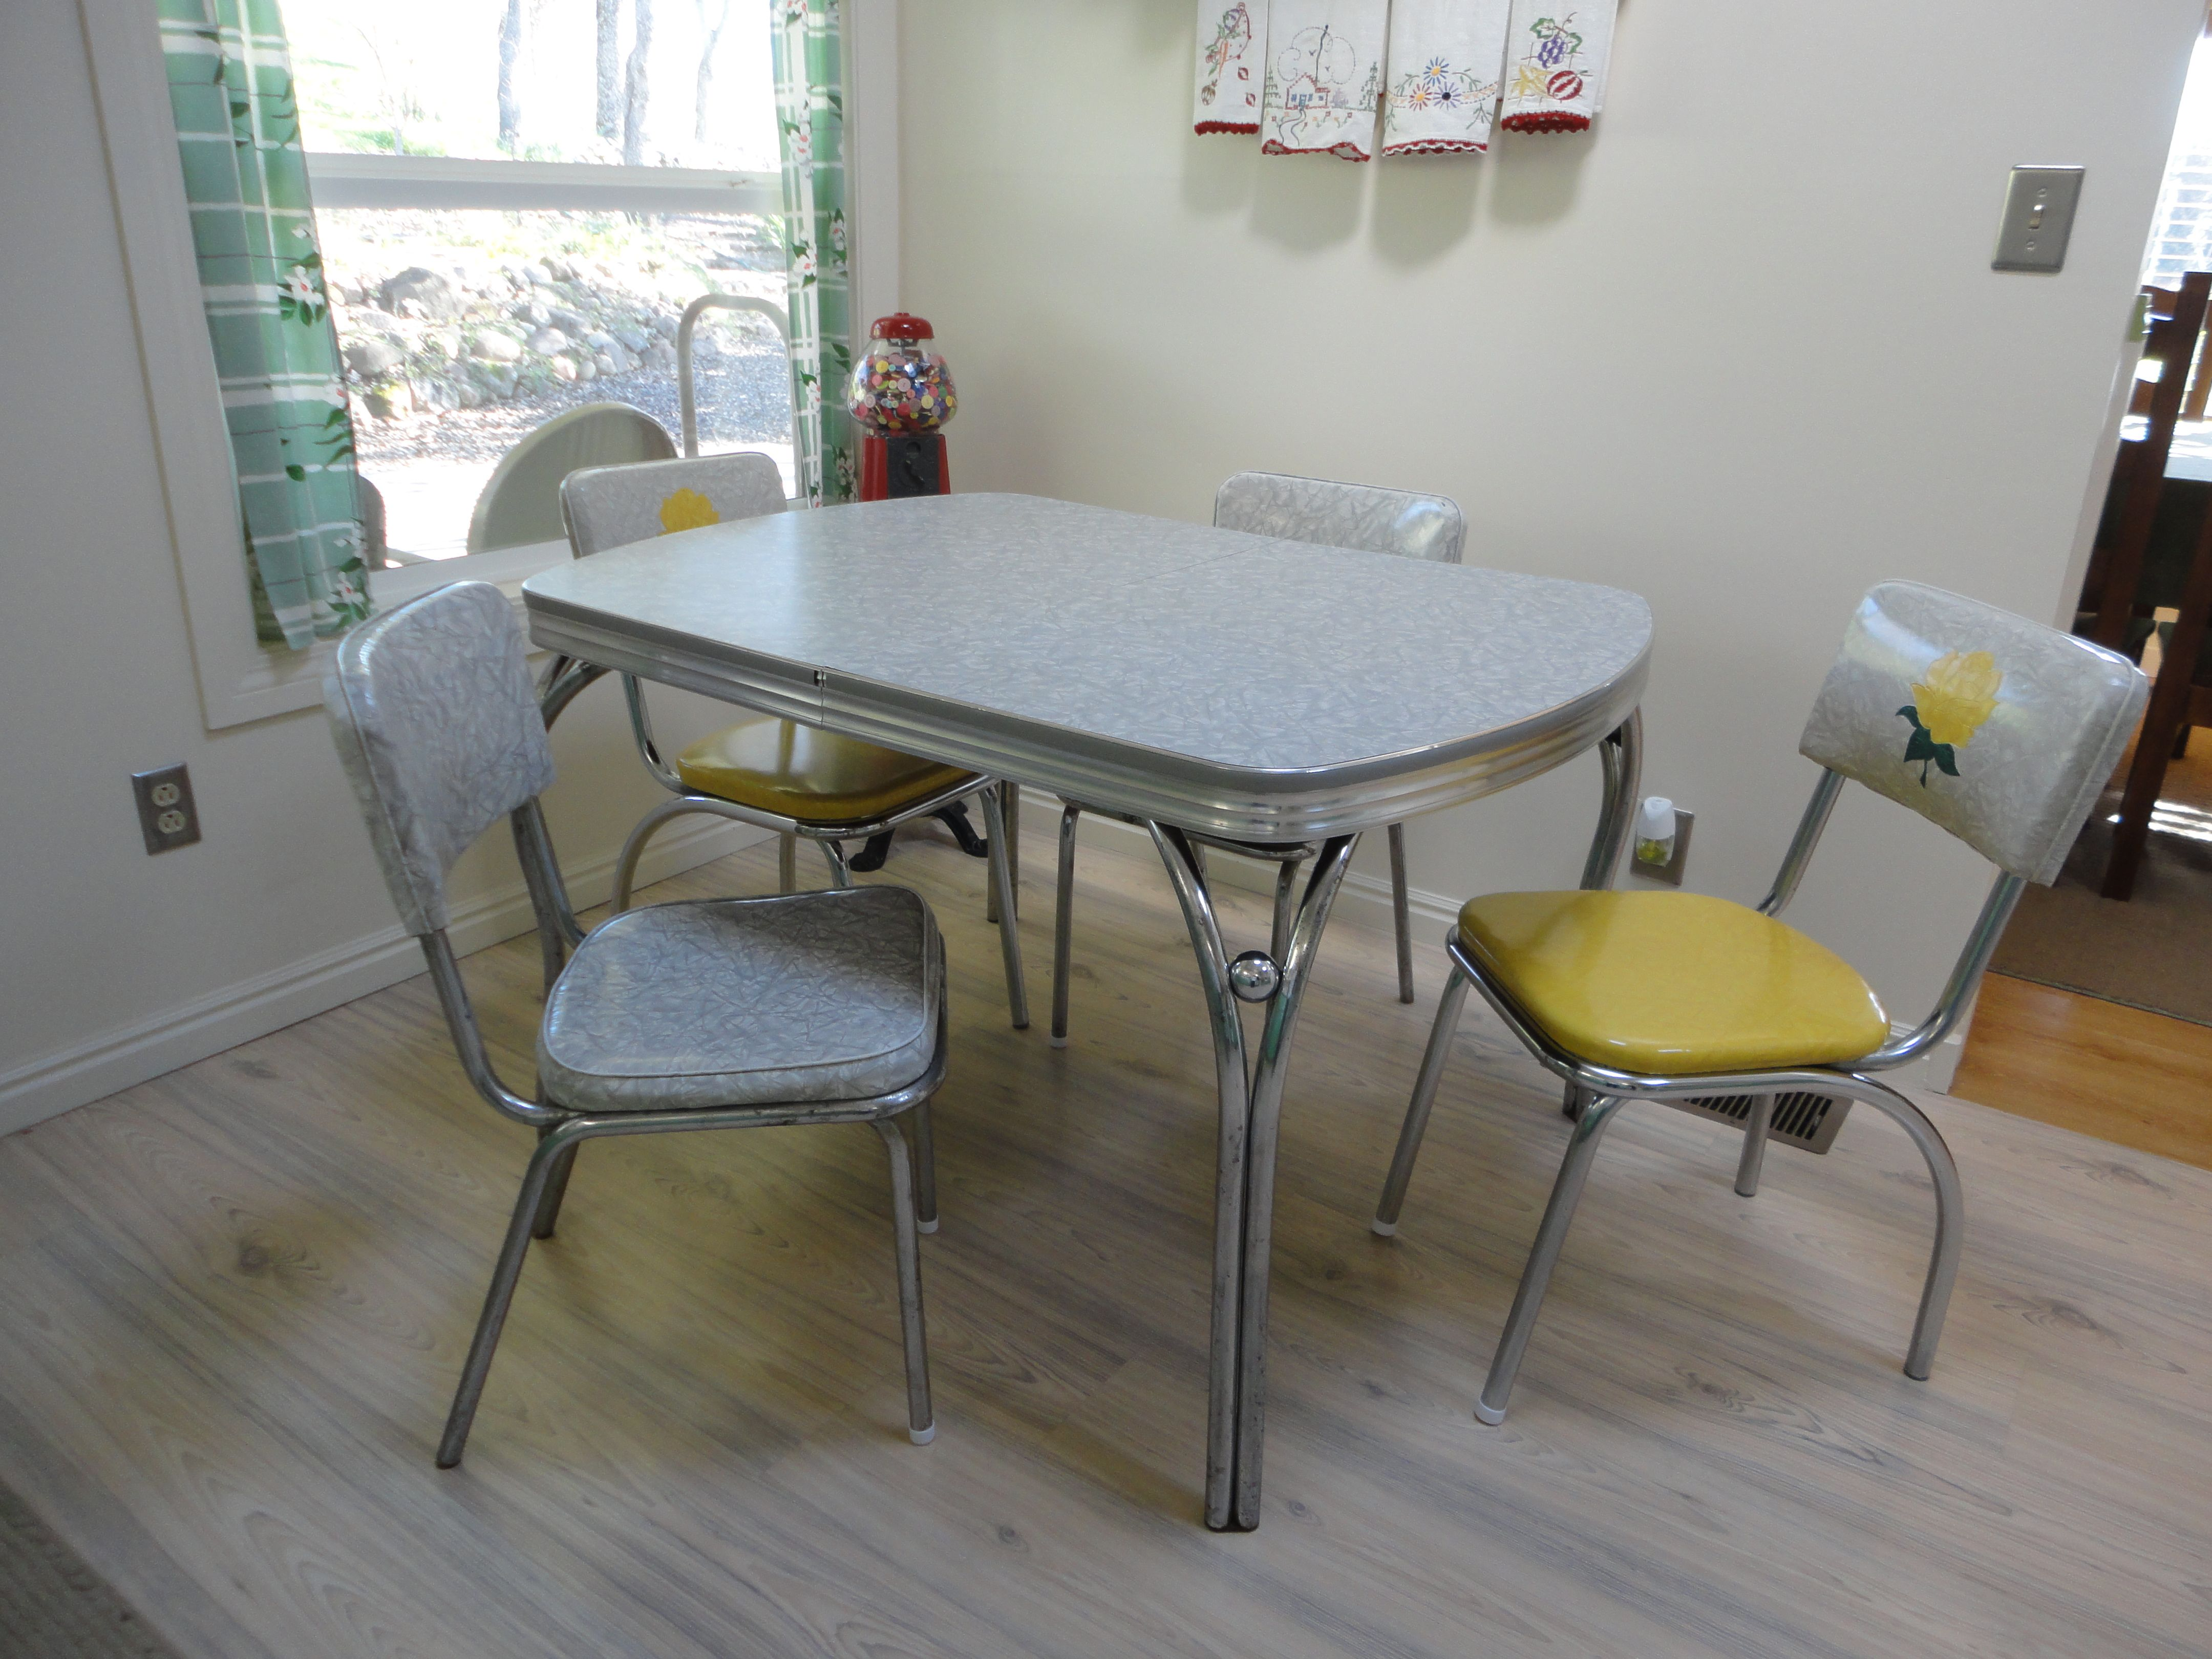 1950 S Retro Chrome Vinyl Dinette Set In 2020 Dinette Sets Kitchen Decor Furniture